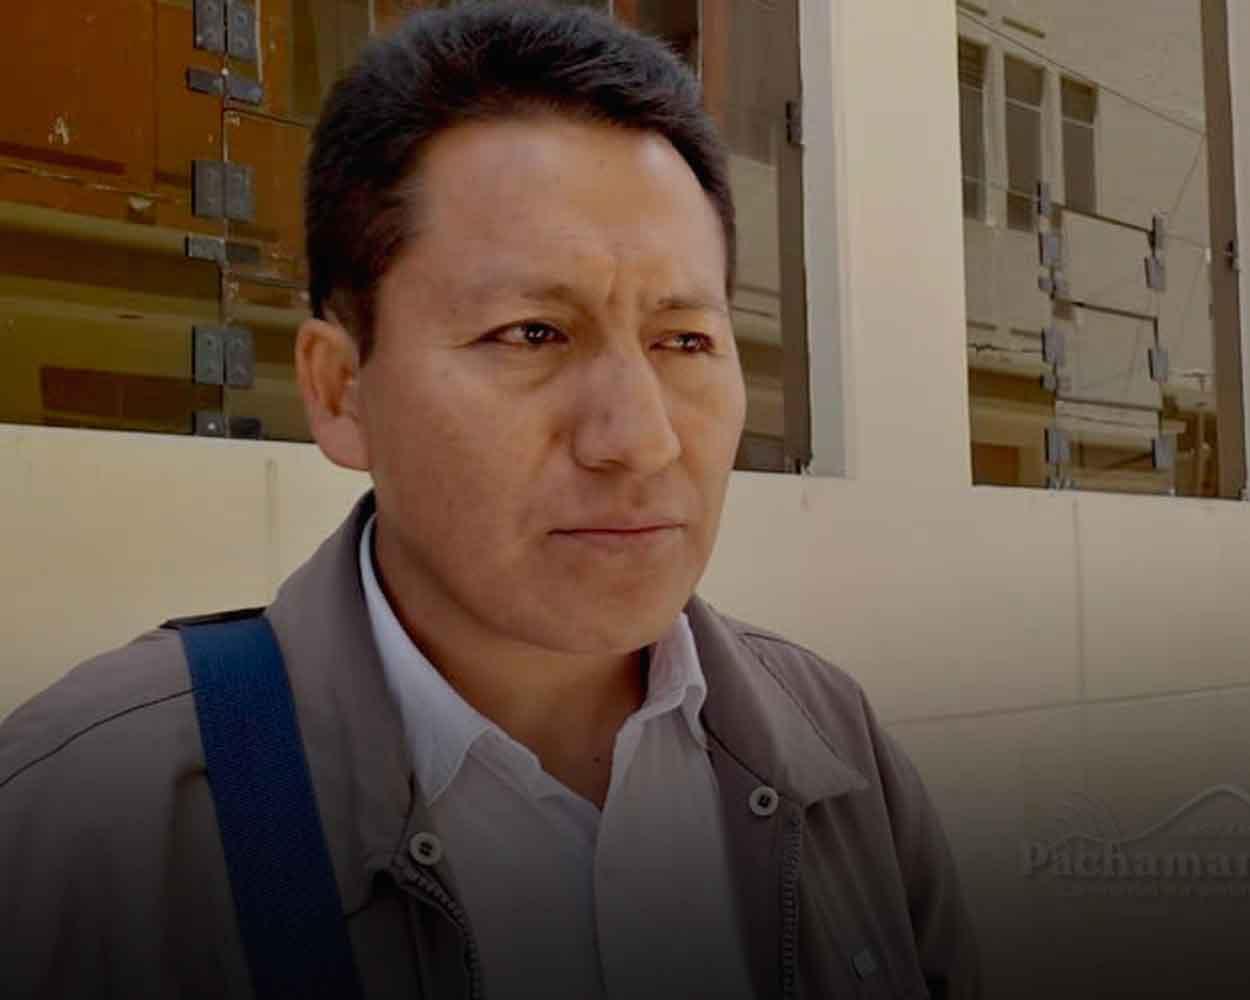 orlando arapa congresista peruano venezolanos